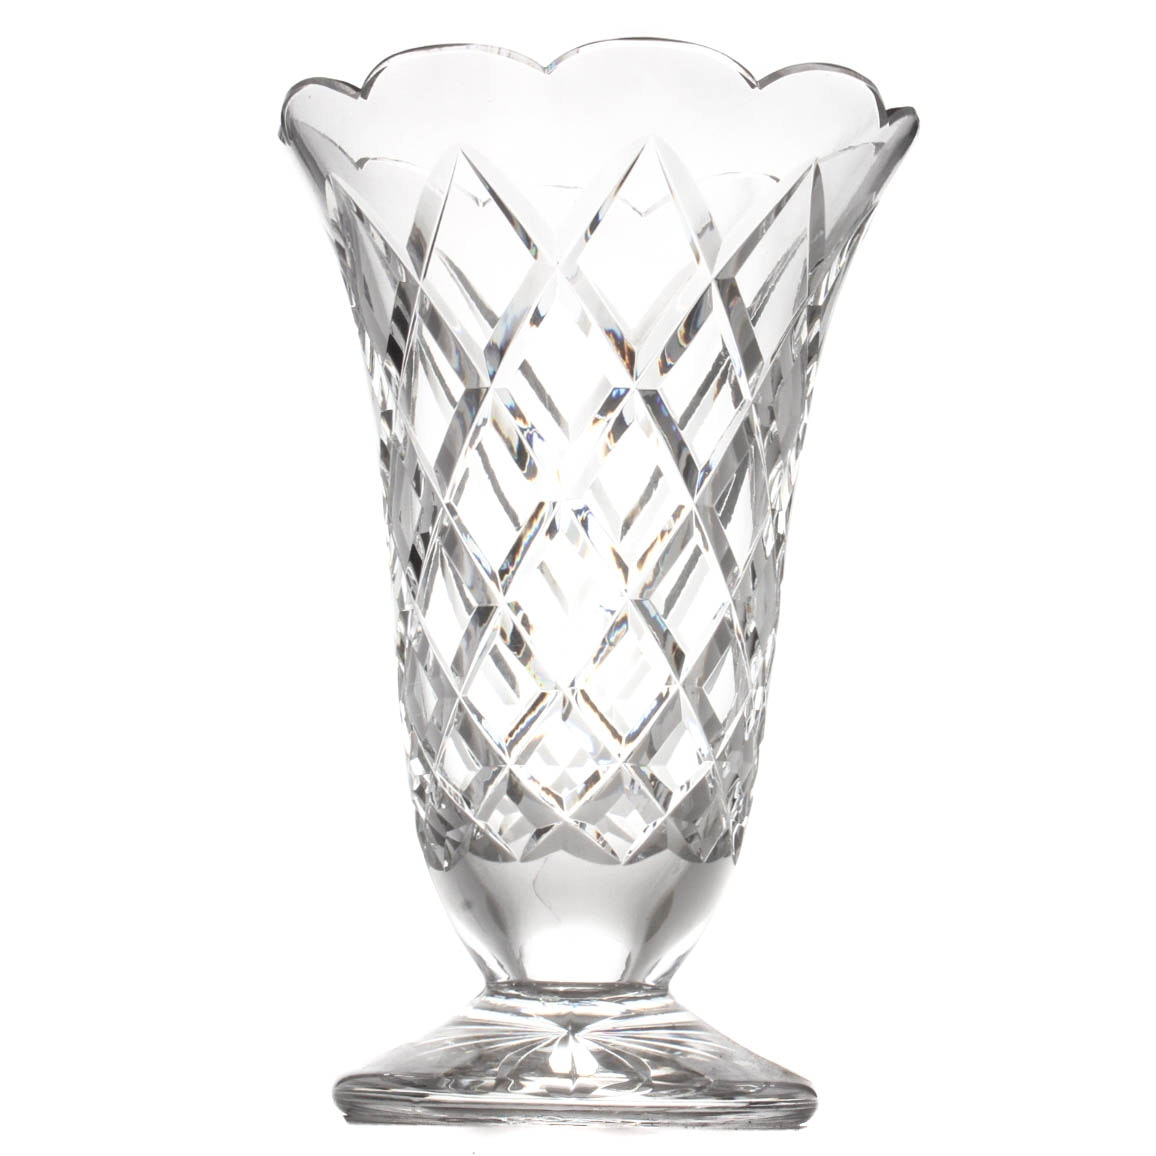 Waterford Crystal Large Footed Vase